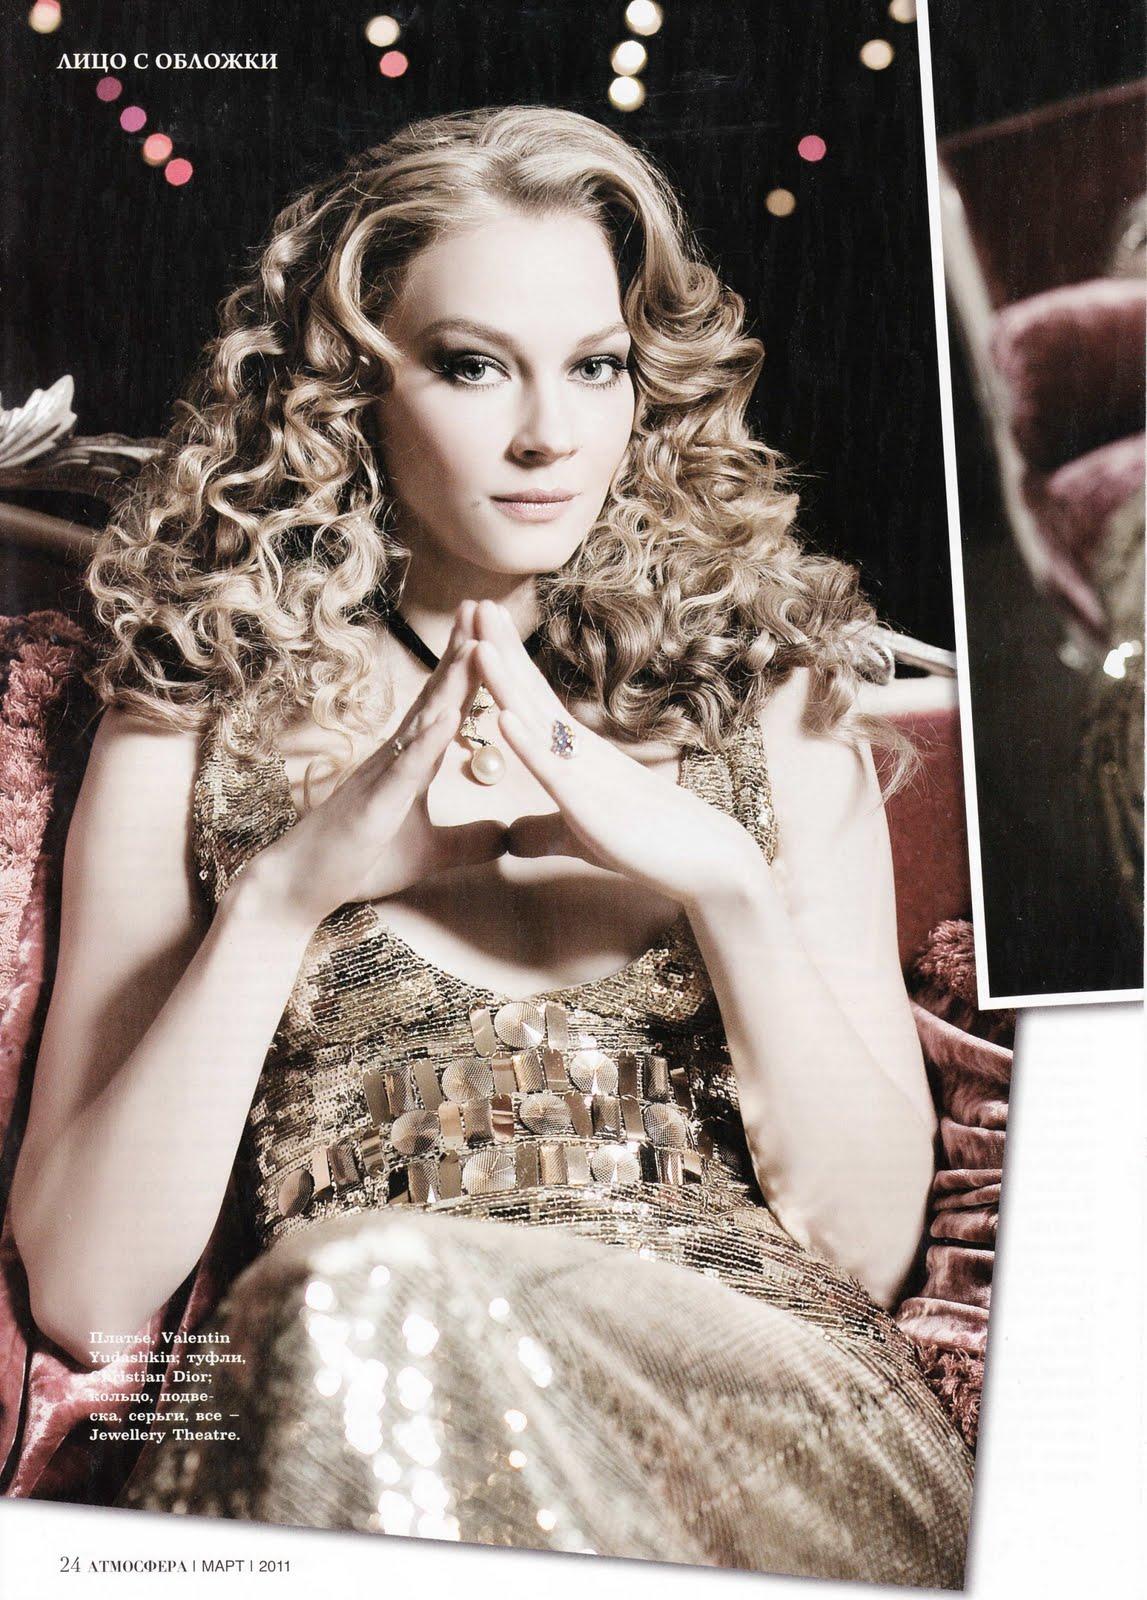 Юлия зимина фото в журнале 14 фотография